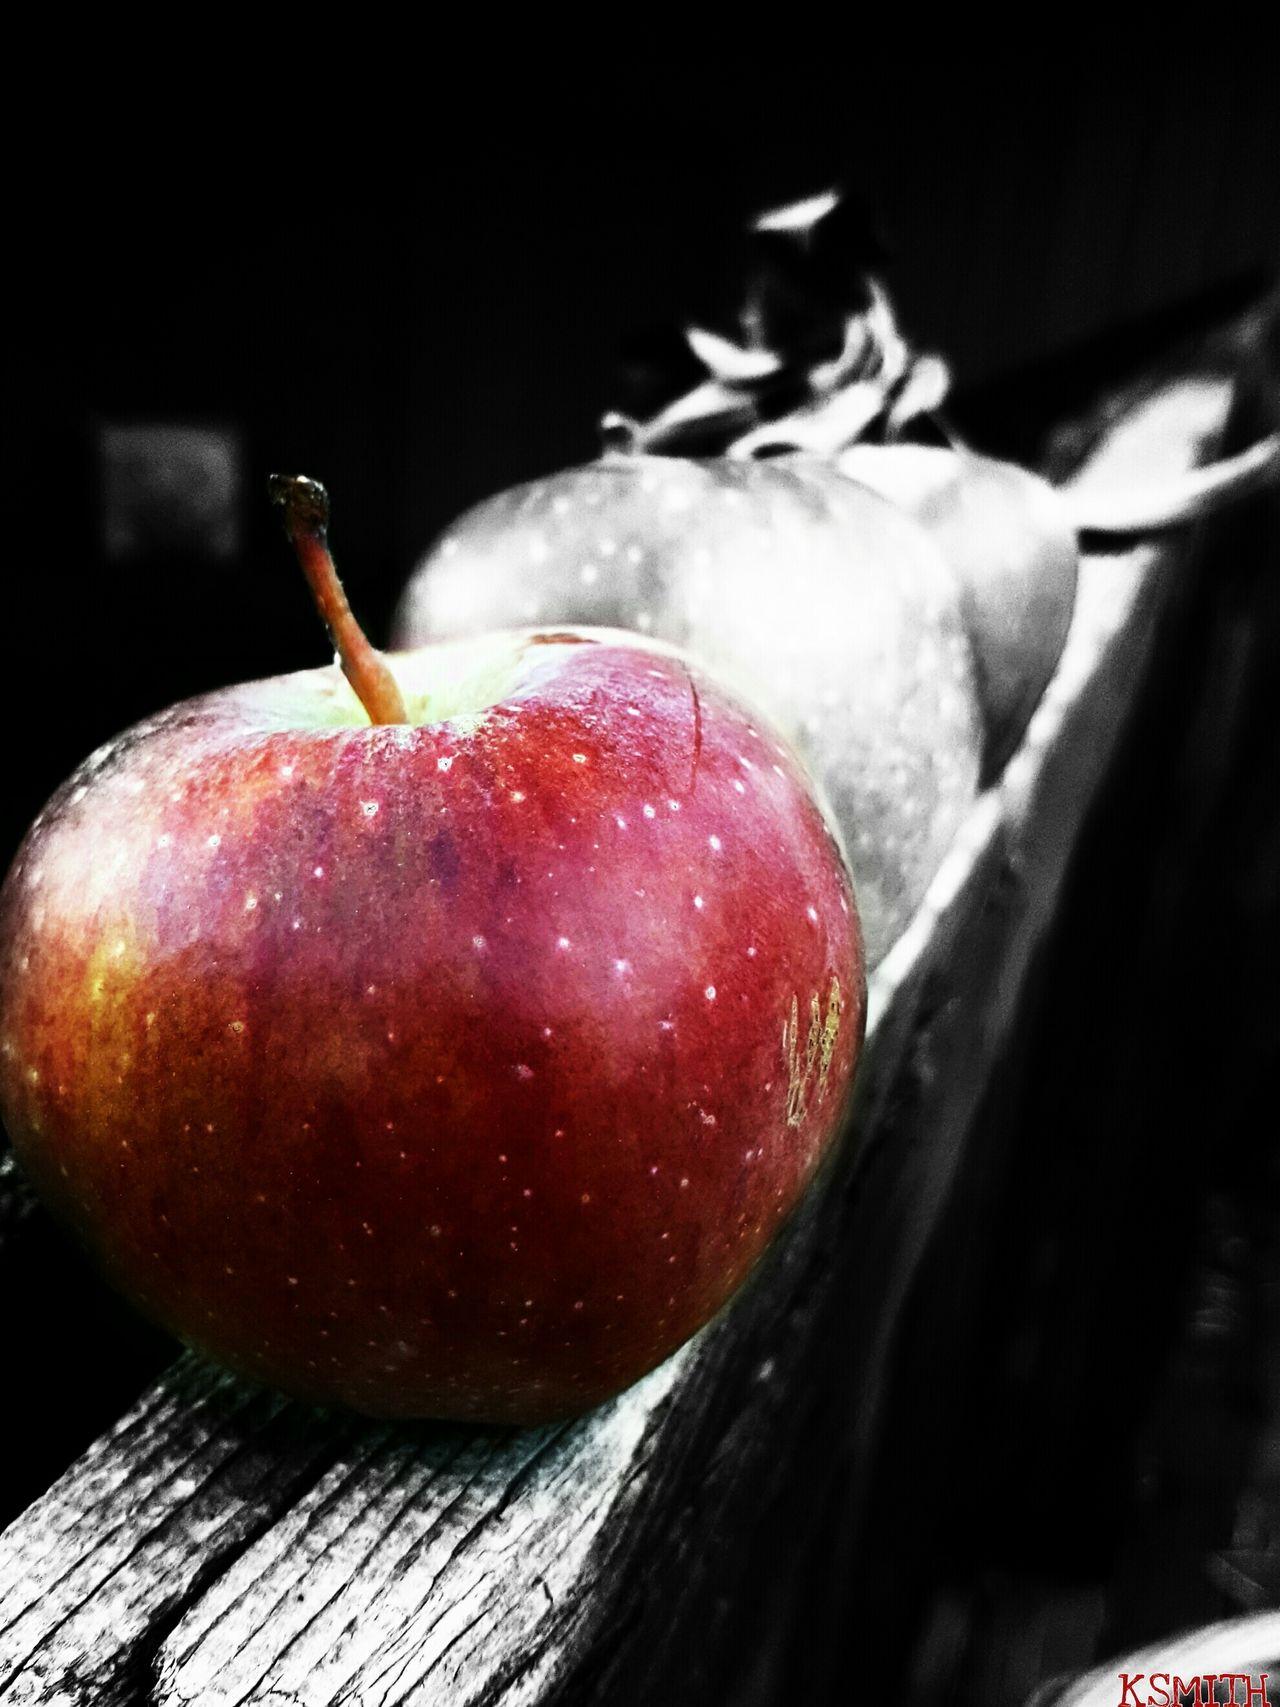 KSMITH22 Edited Black Background Tranquility Nature Close-up Apple Colorsplash